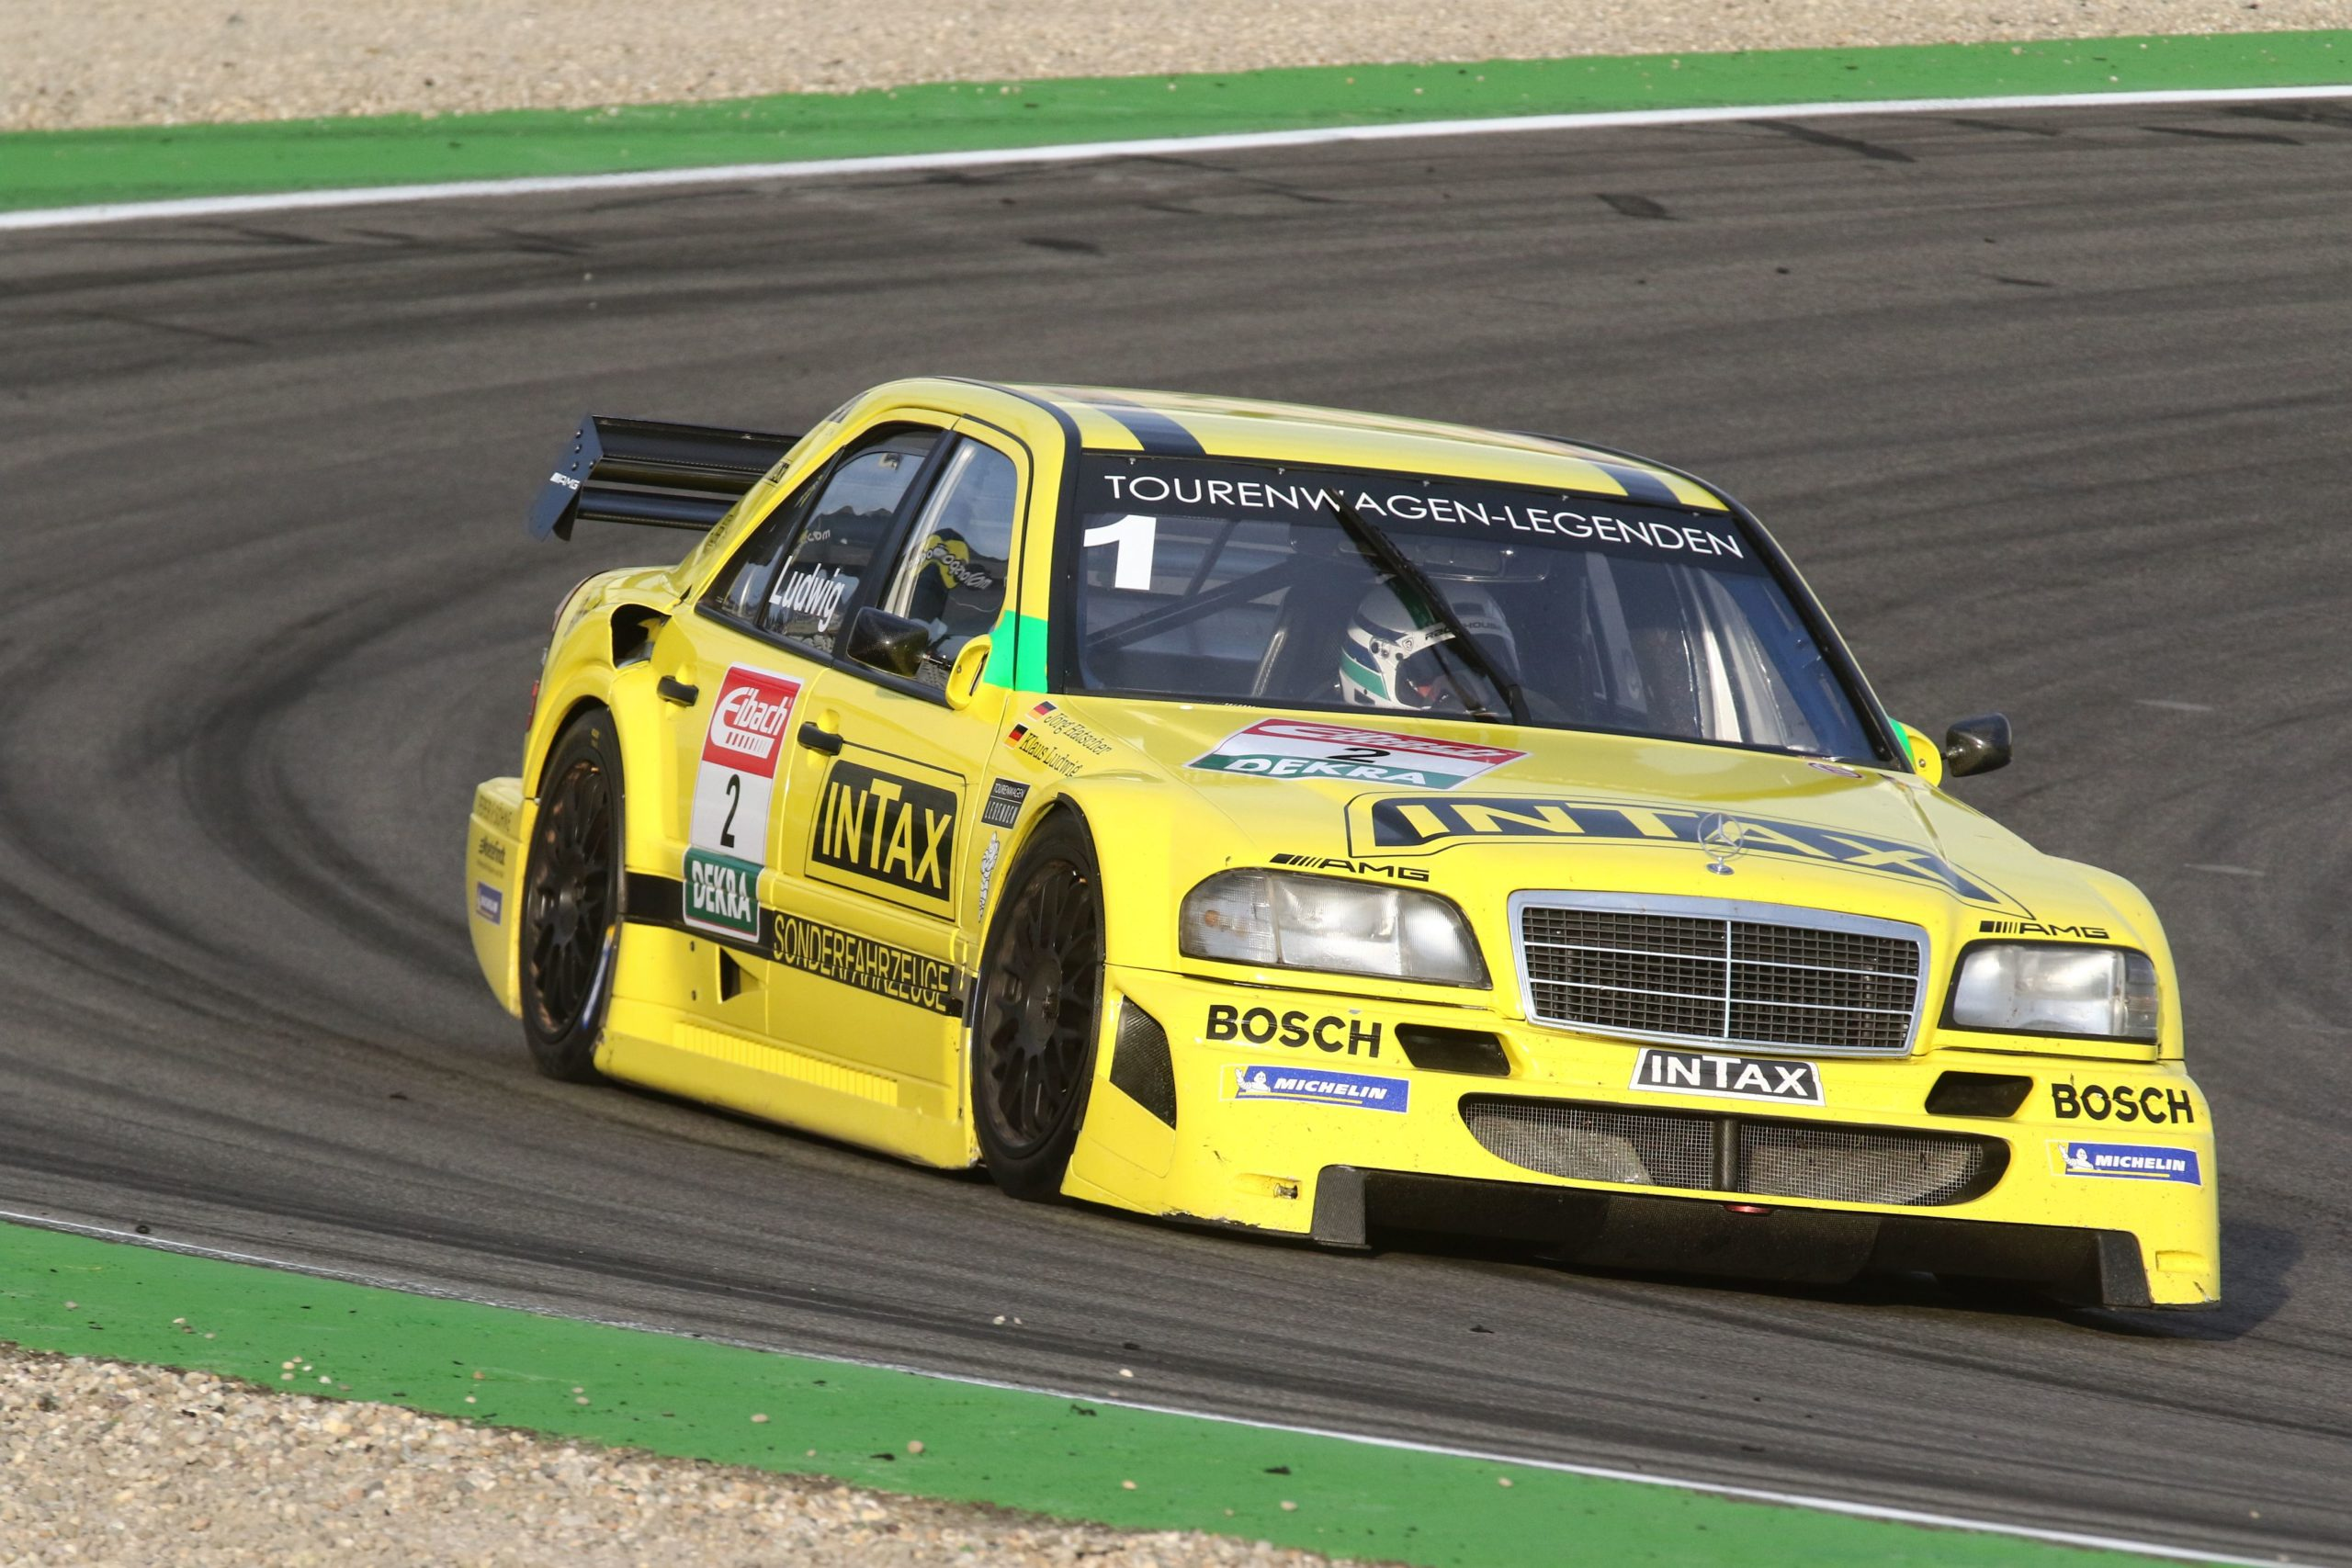 DTM-Classic-tst-sport-und-technik-Mercedes-Benz-Klaus-Ludwig-2128803